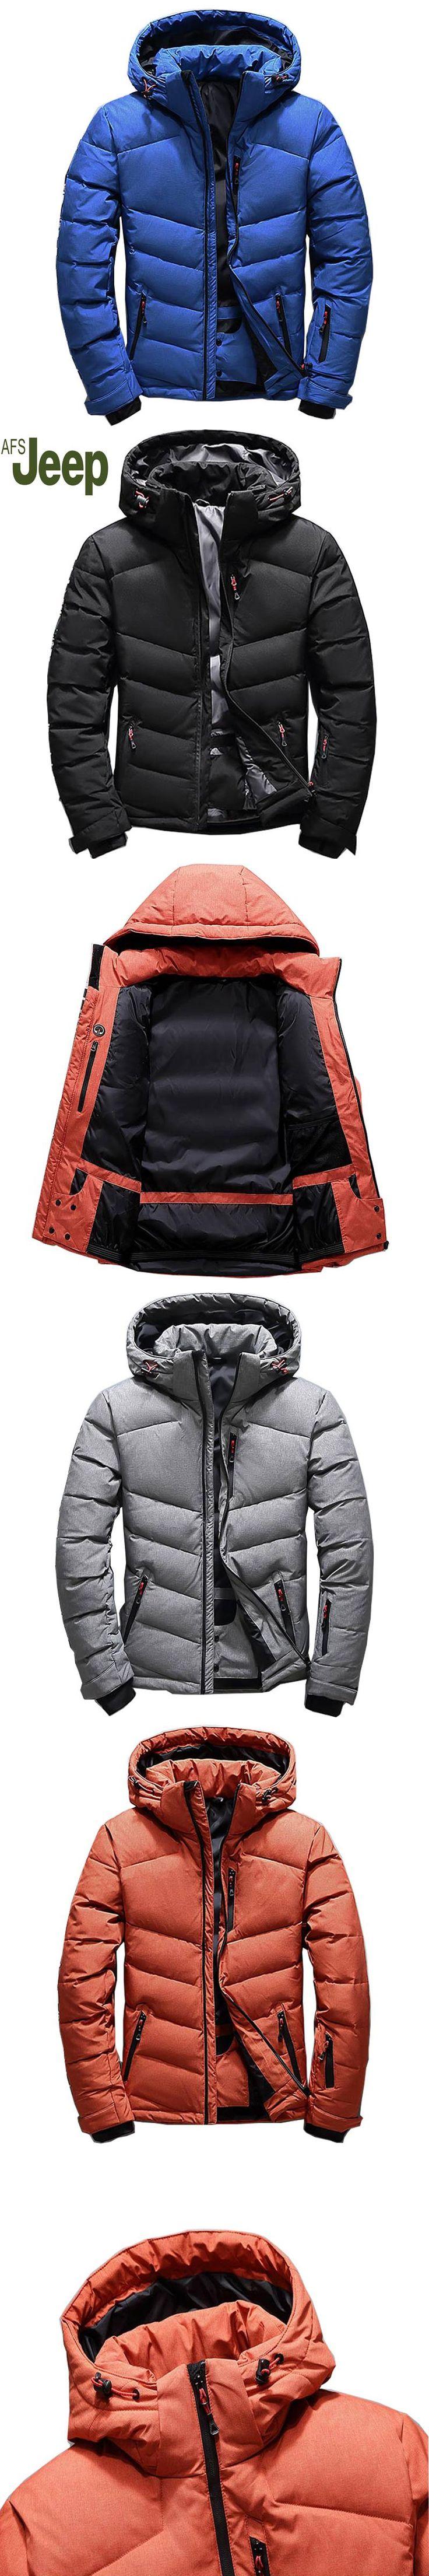 2018 The new Hot Men's  winter new Korean Slim padded Coat Jacket Men Parka Thickening Down Men Jacket M-3XL 4 colors  230